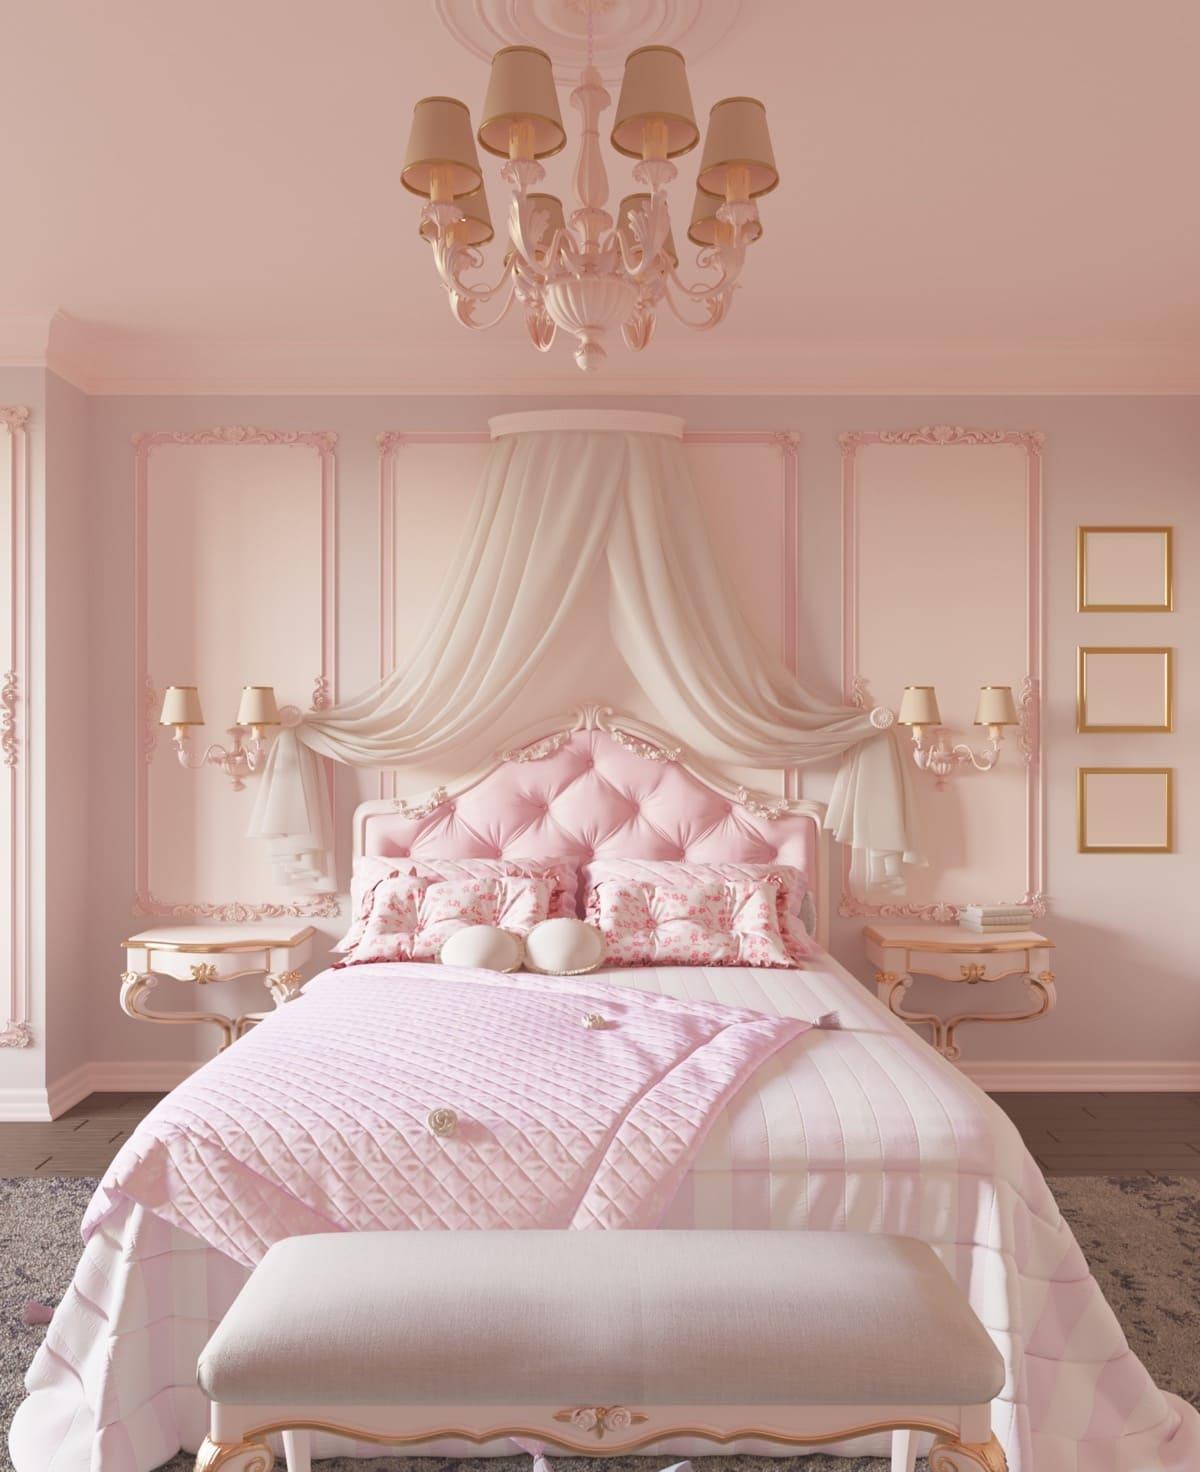 интерьер спальни фото 10